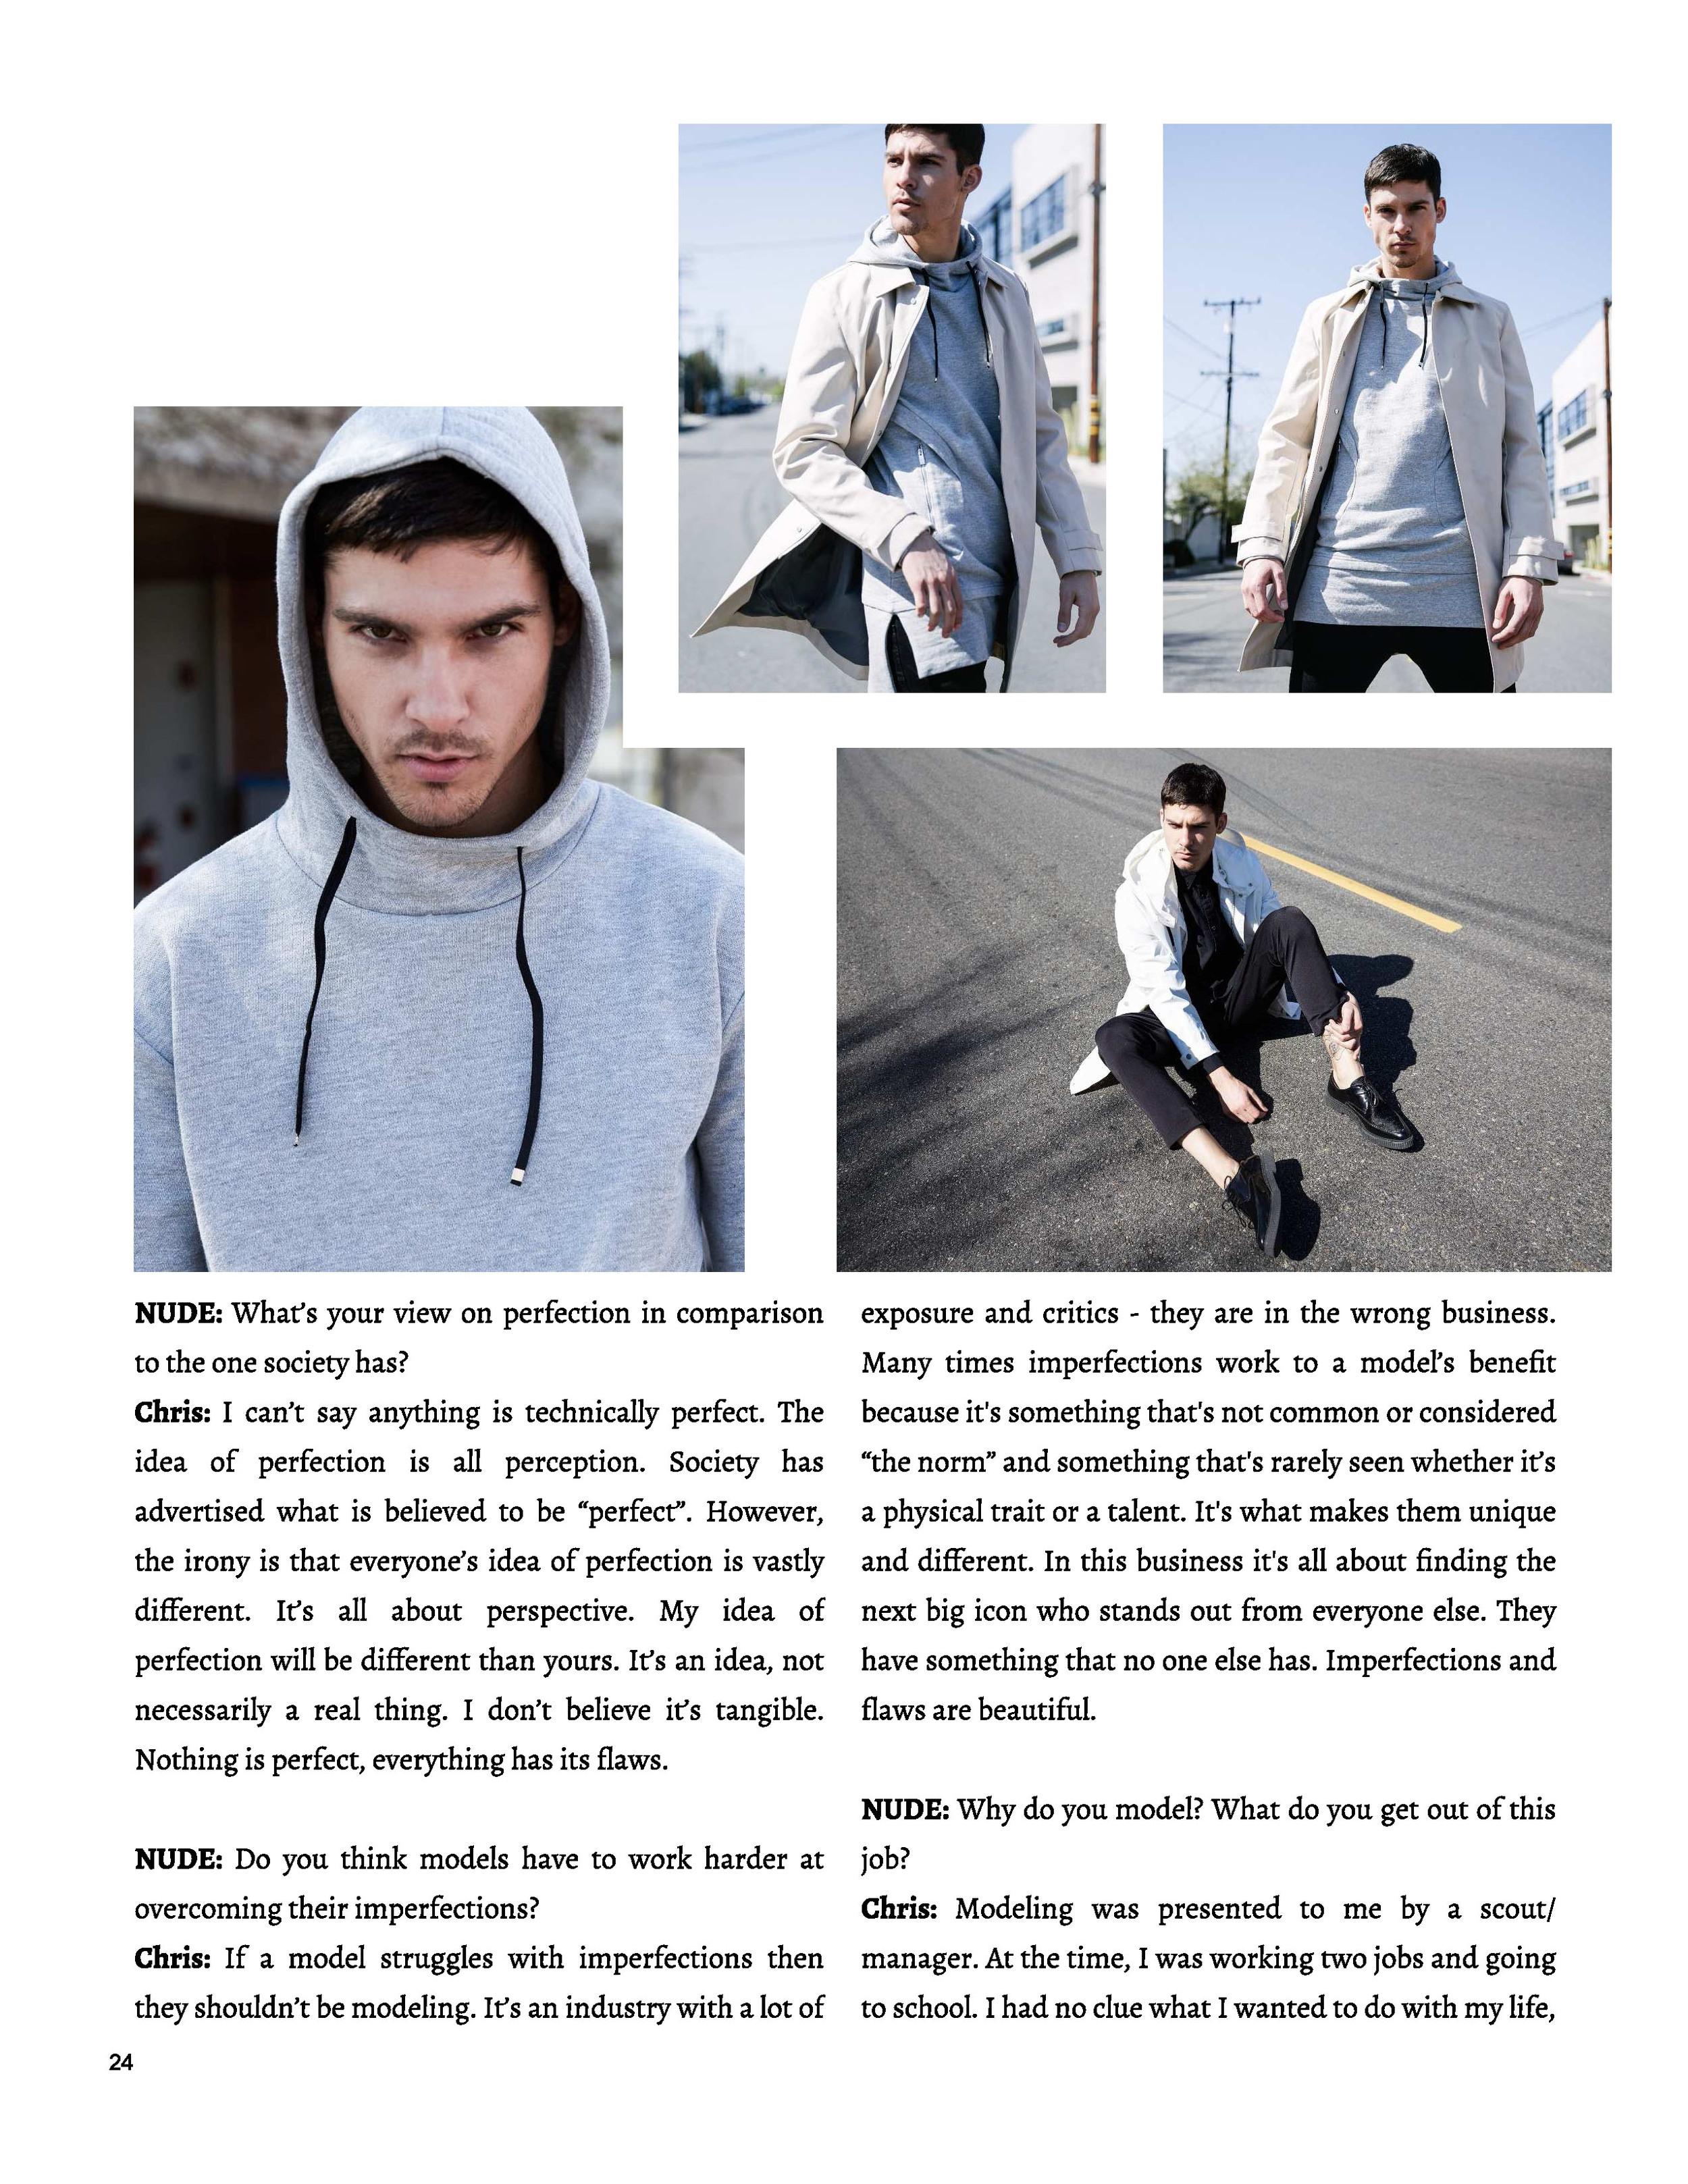 Chris_Petersen_NUDEMagazineIssue3_LA-Models_1.jpg